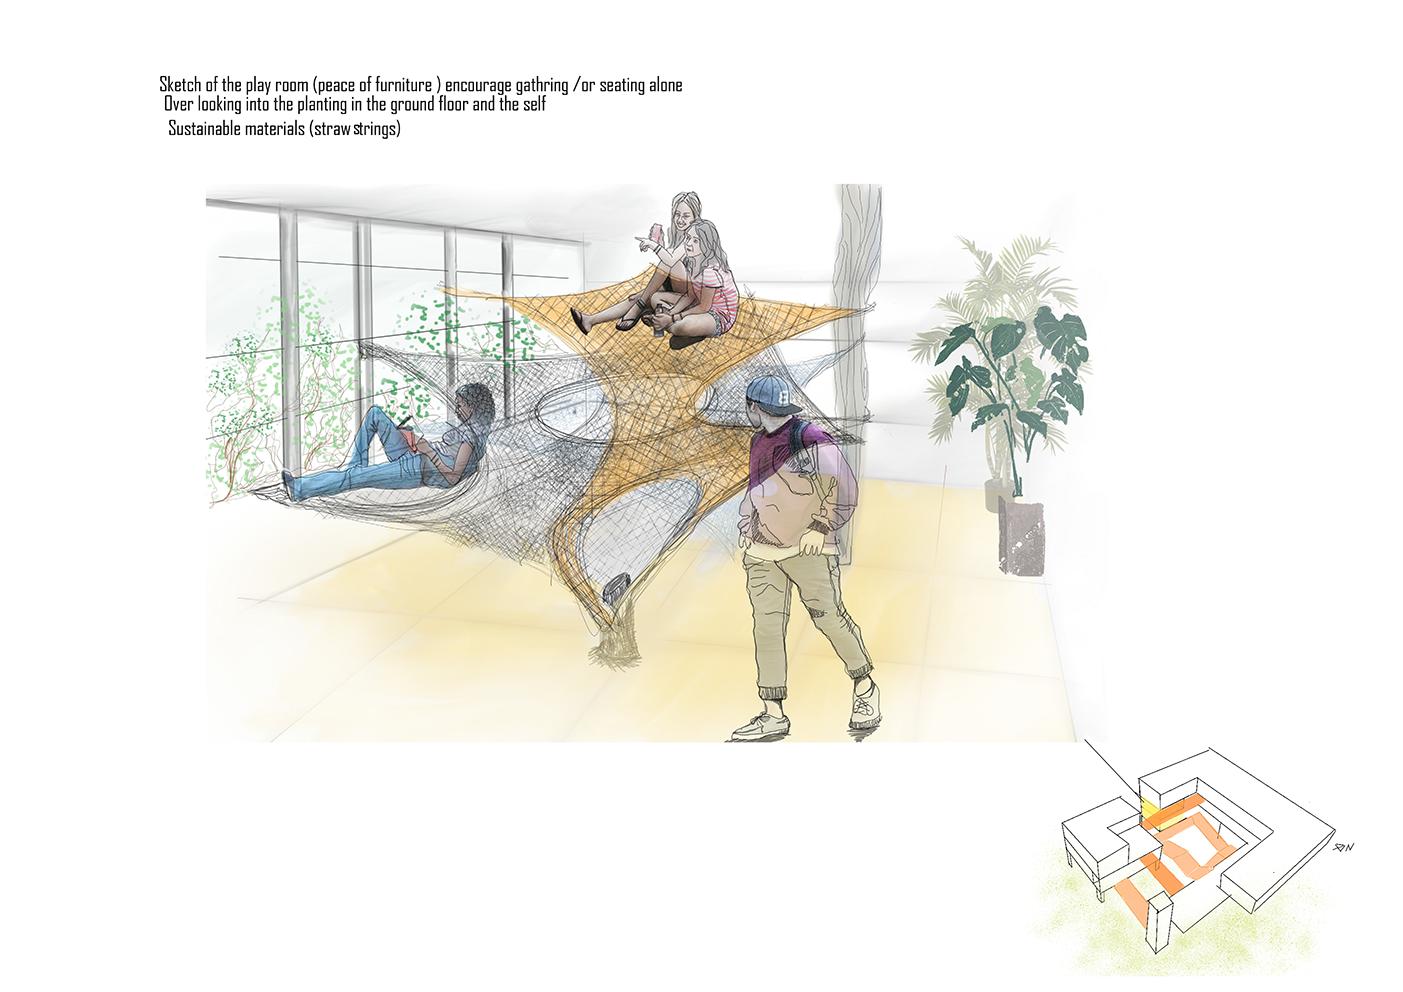 Concept sketch of playroom furniture